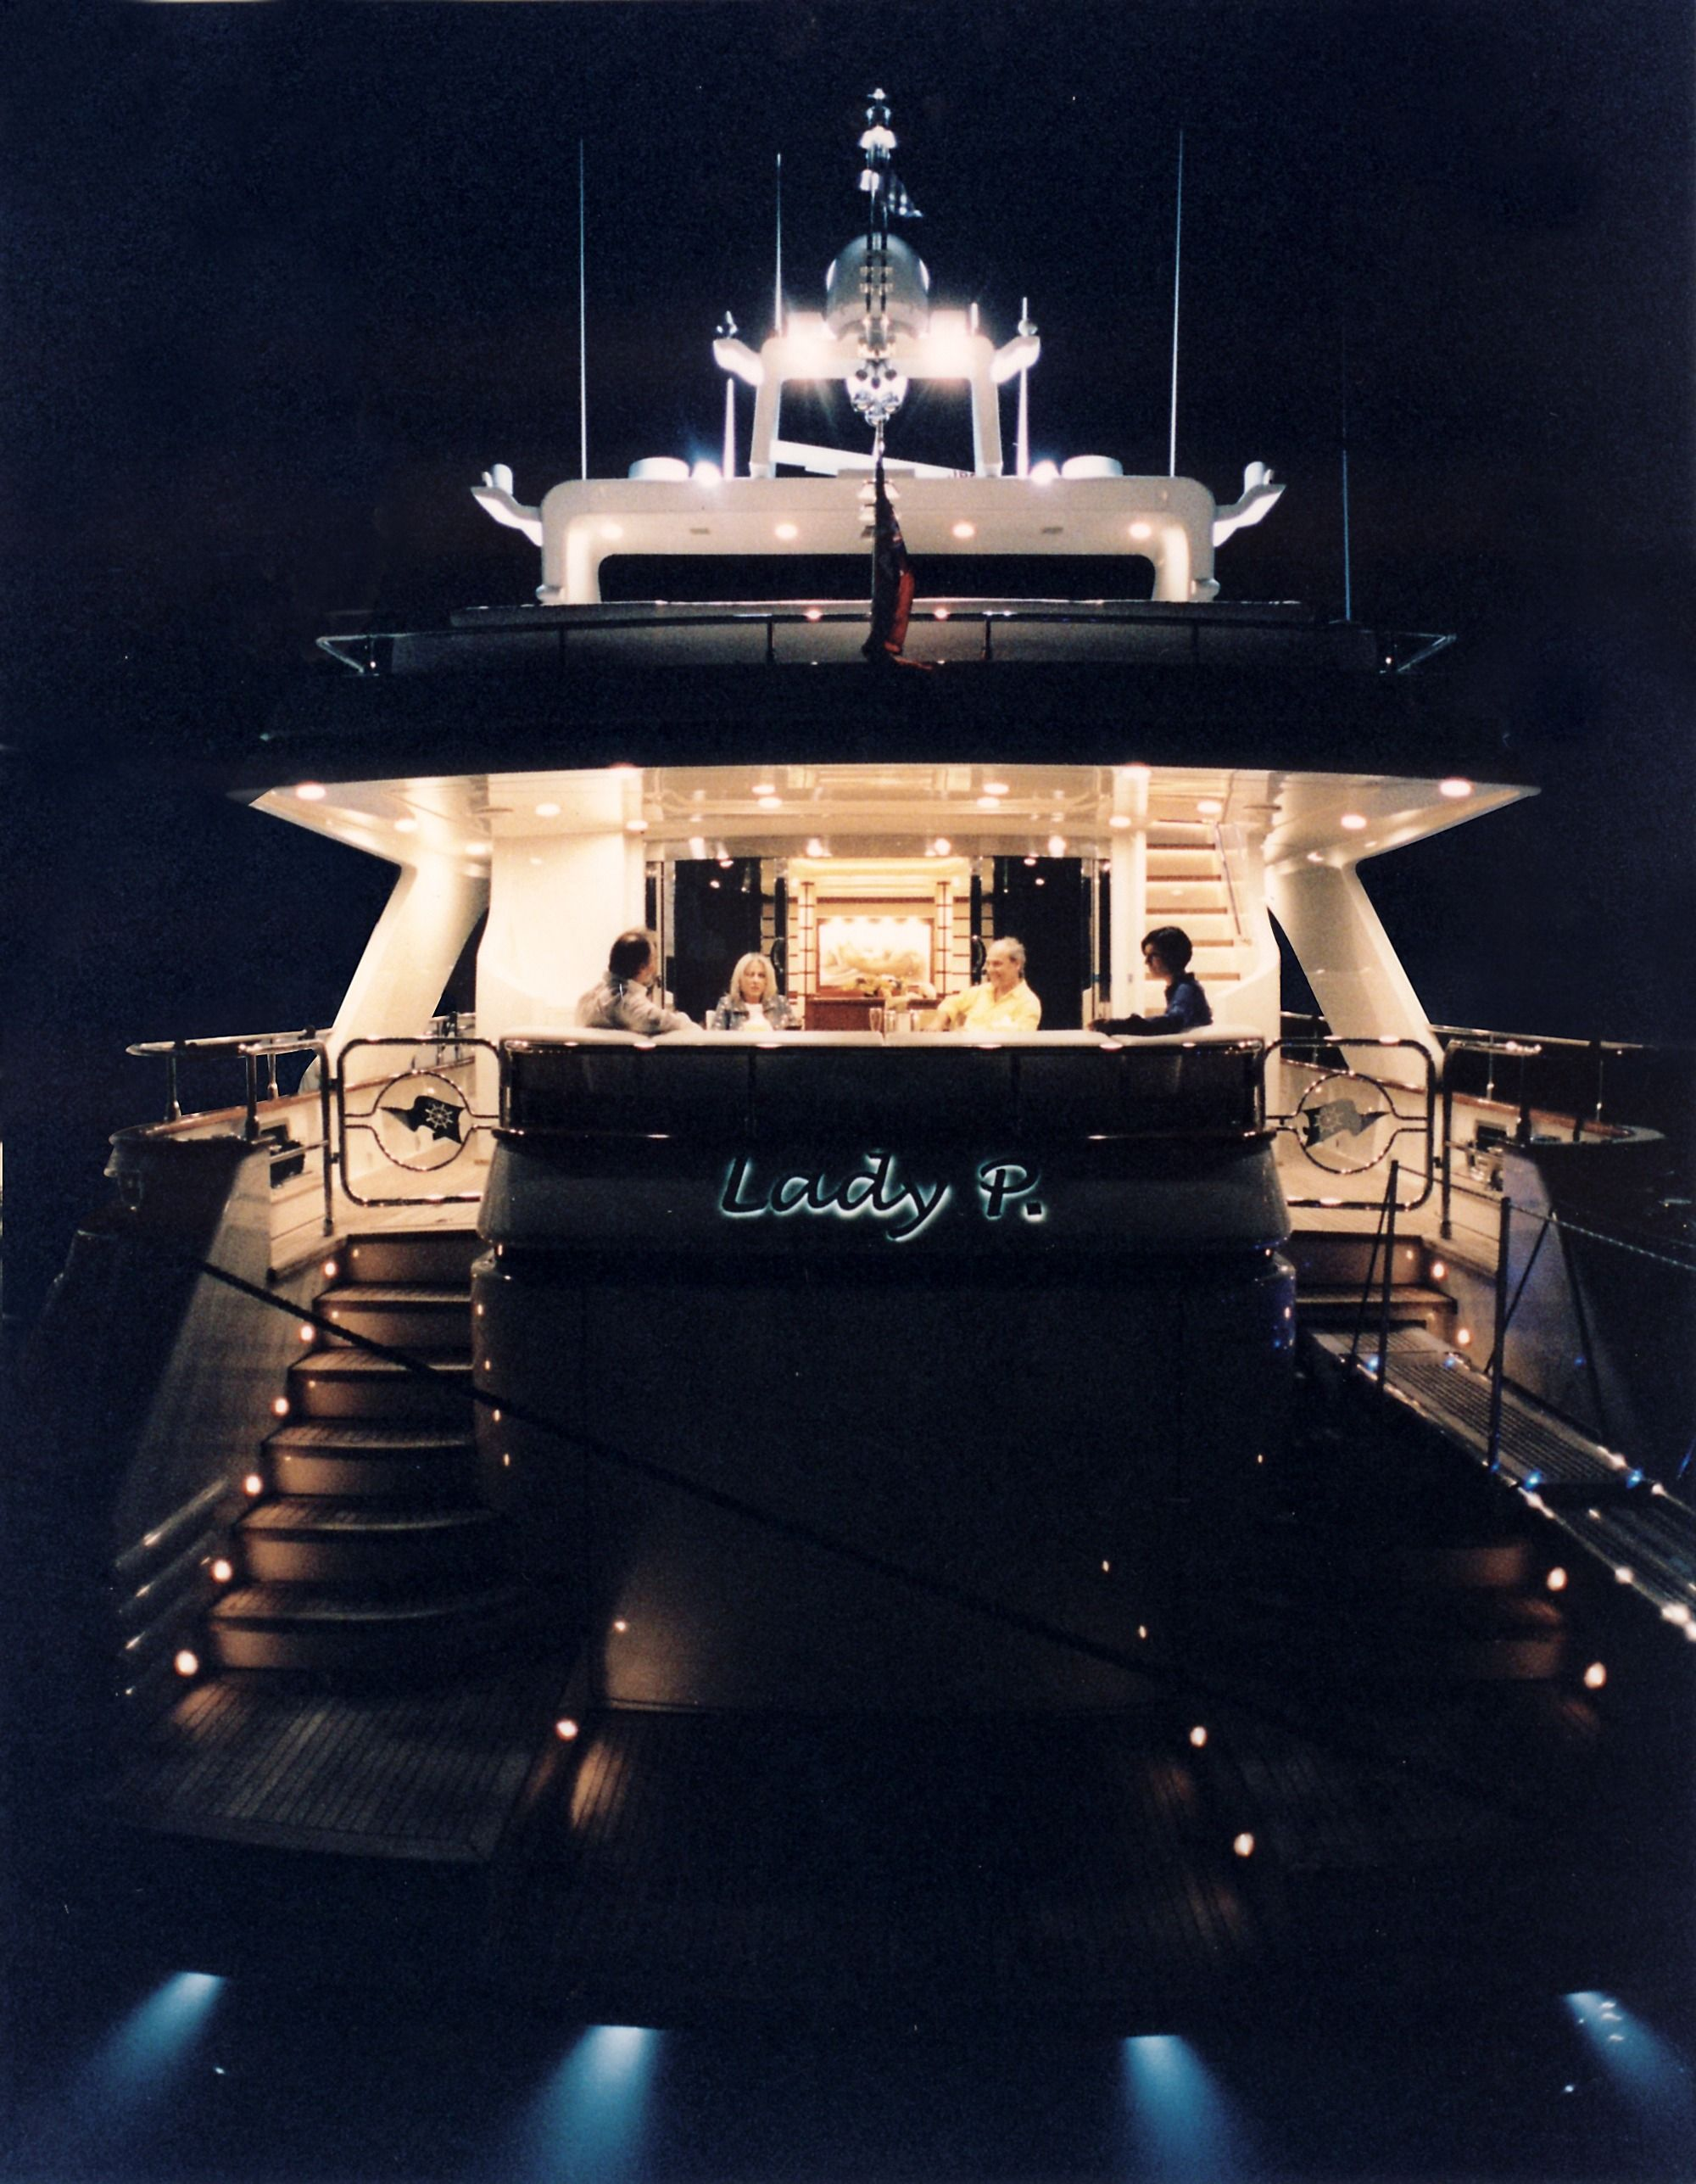 LADY P - Crewed Motor Yacht - Stern by Night